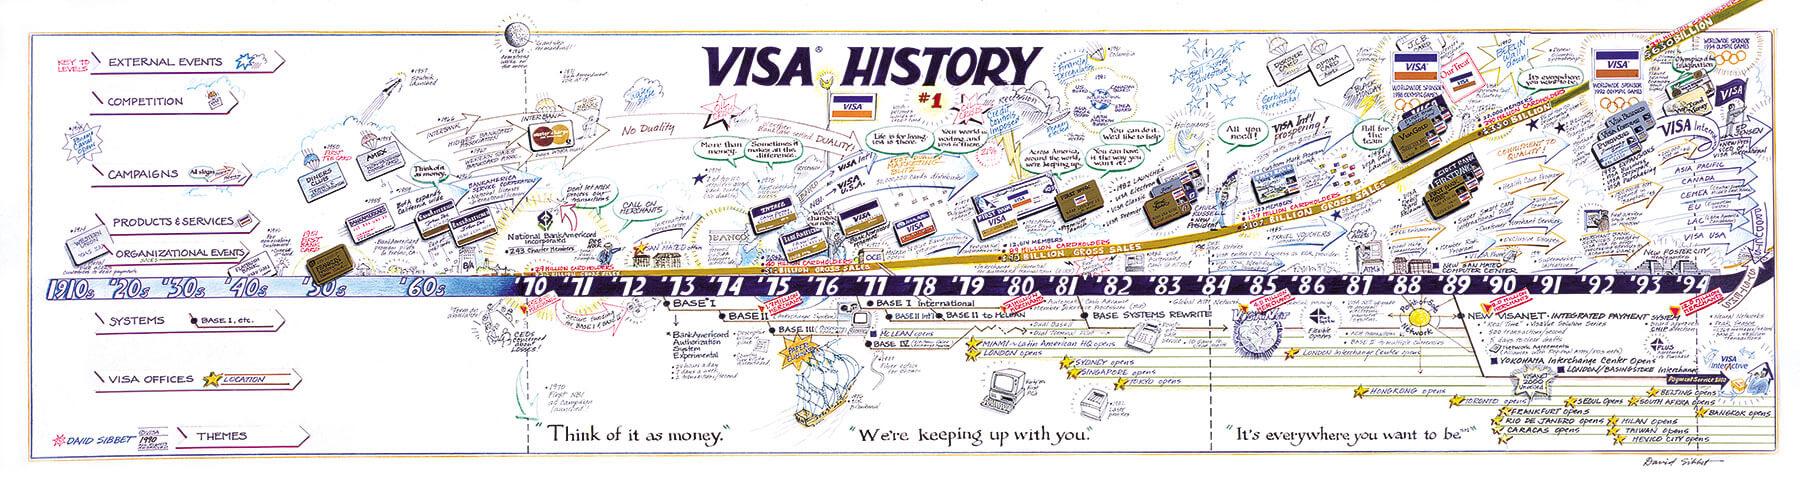 Visa History - Portfolio - David Sibbet